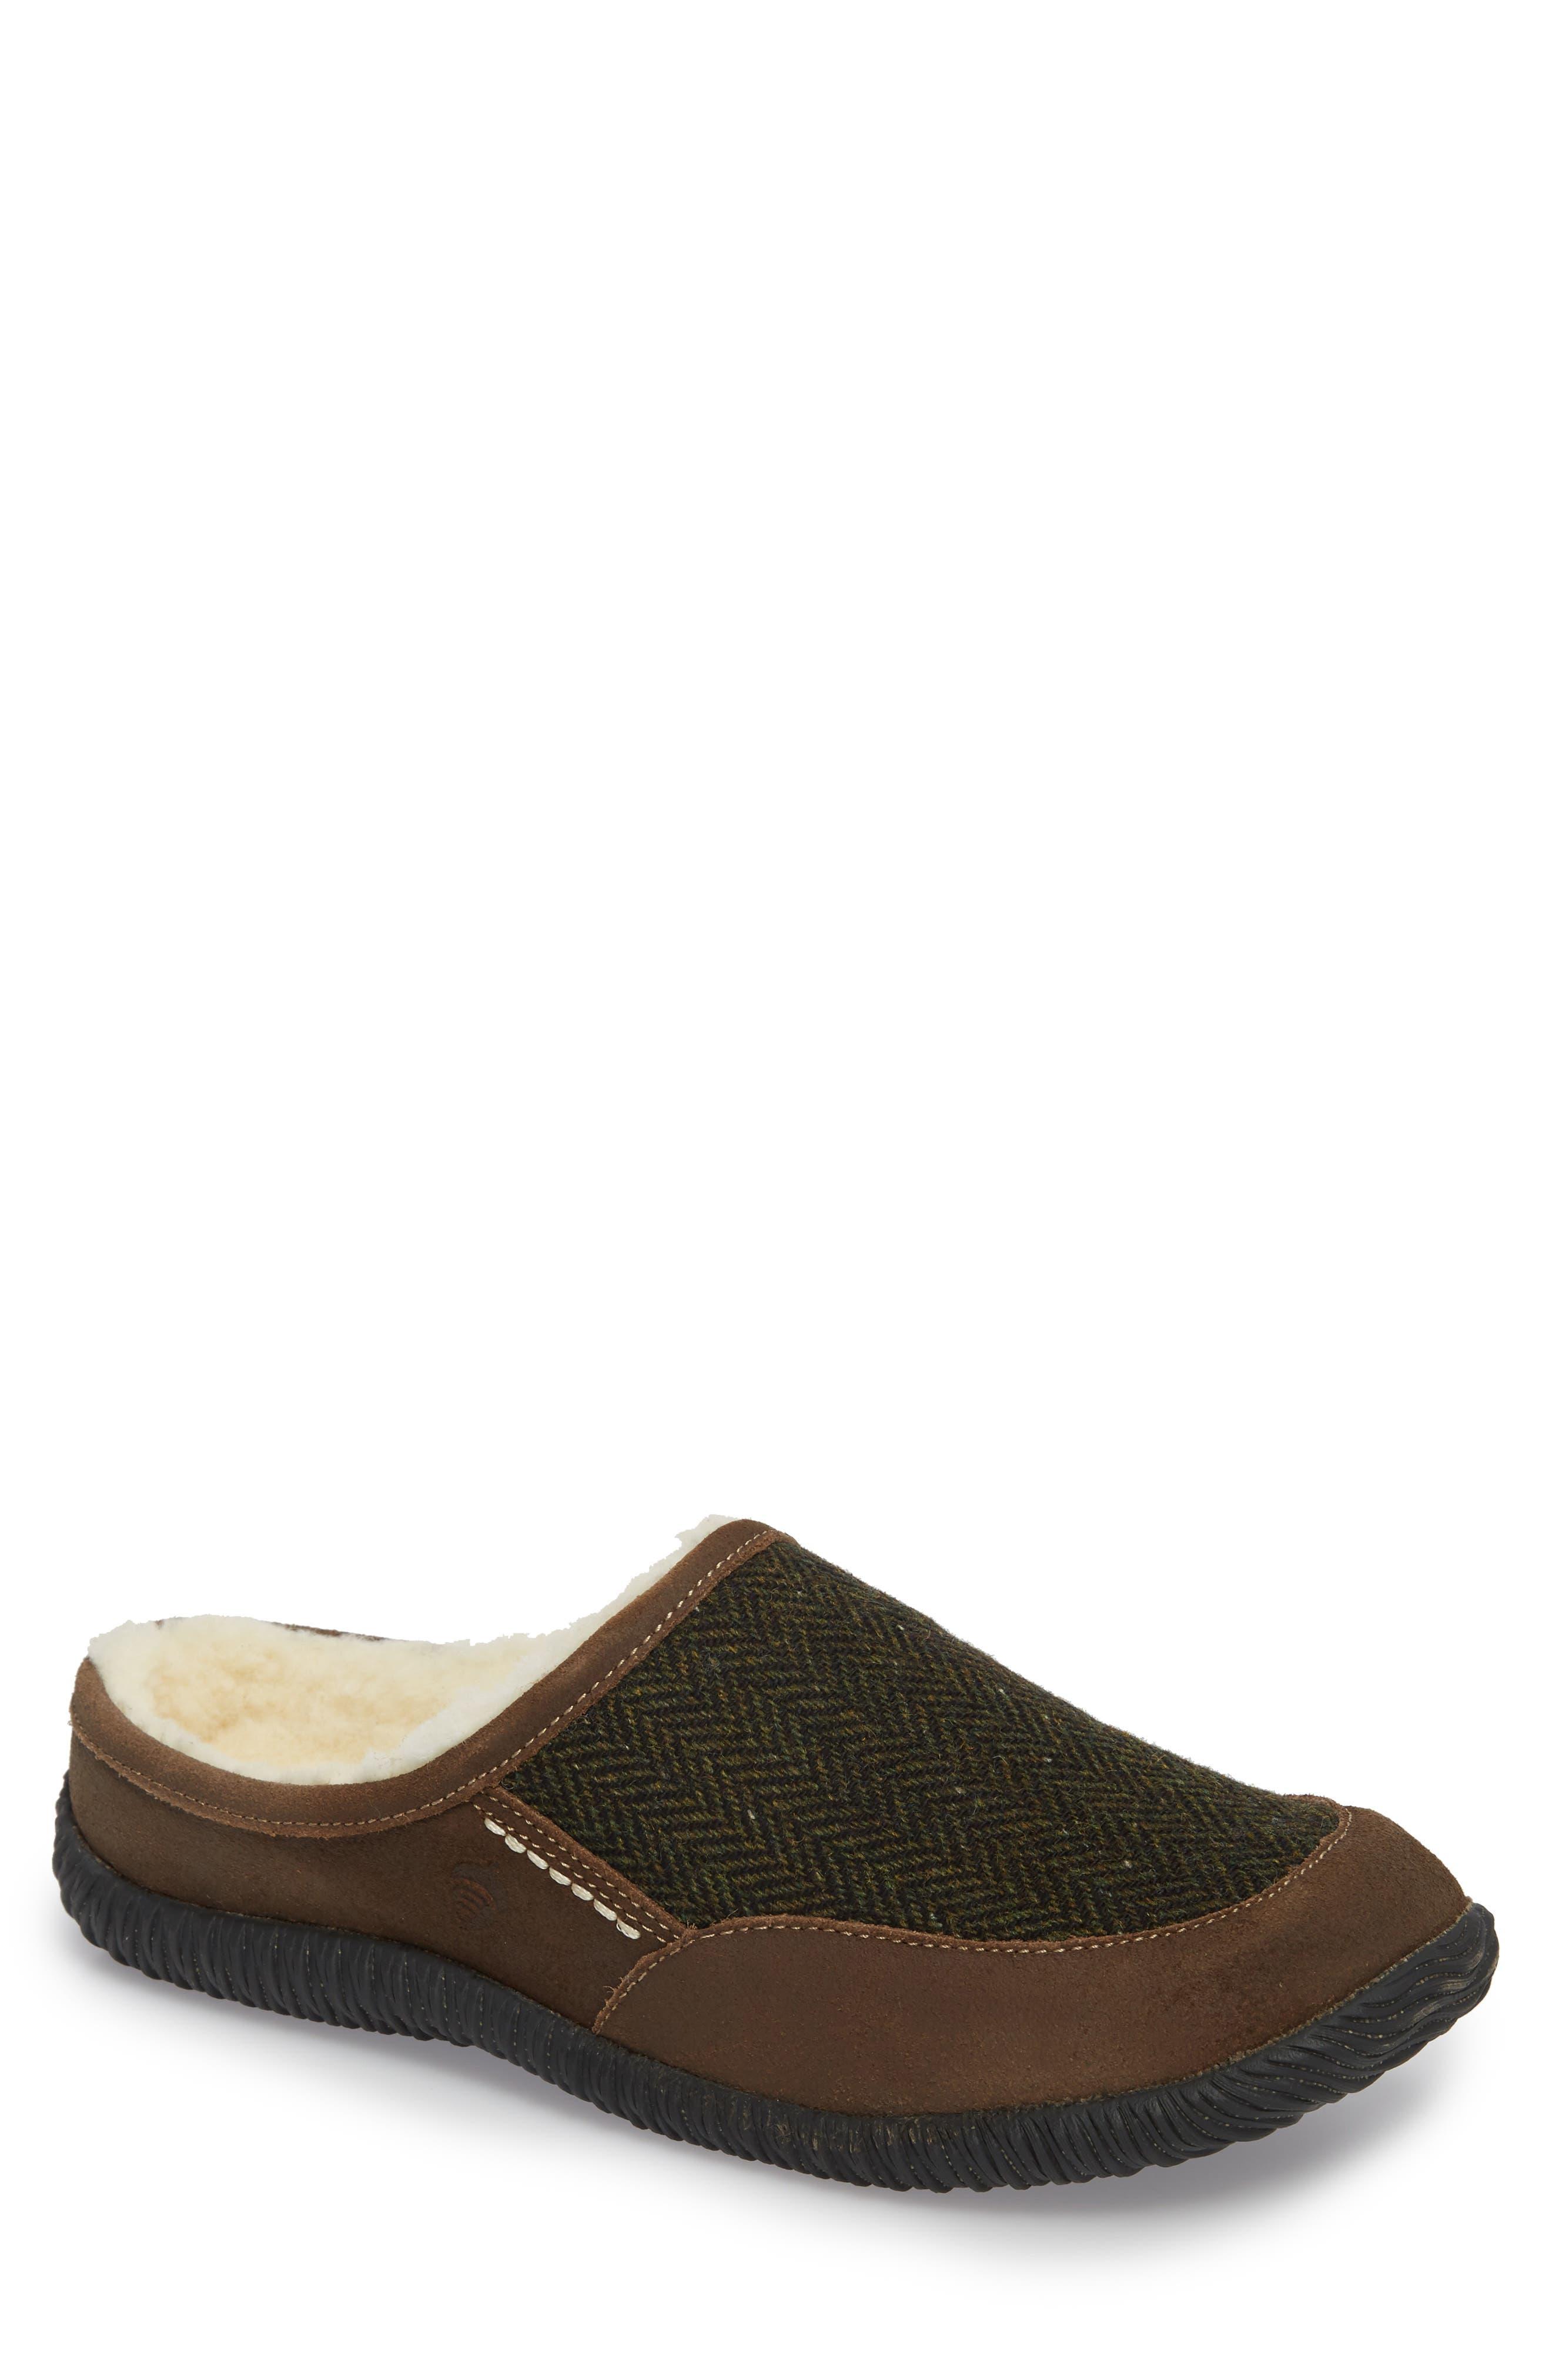 'Rambler' Mule Slipper,                         Main,                         color, Olive Tweed/ Brown